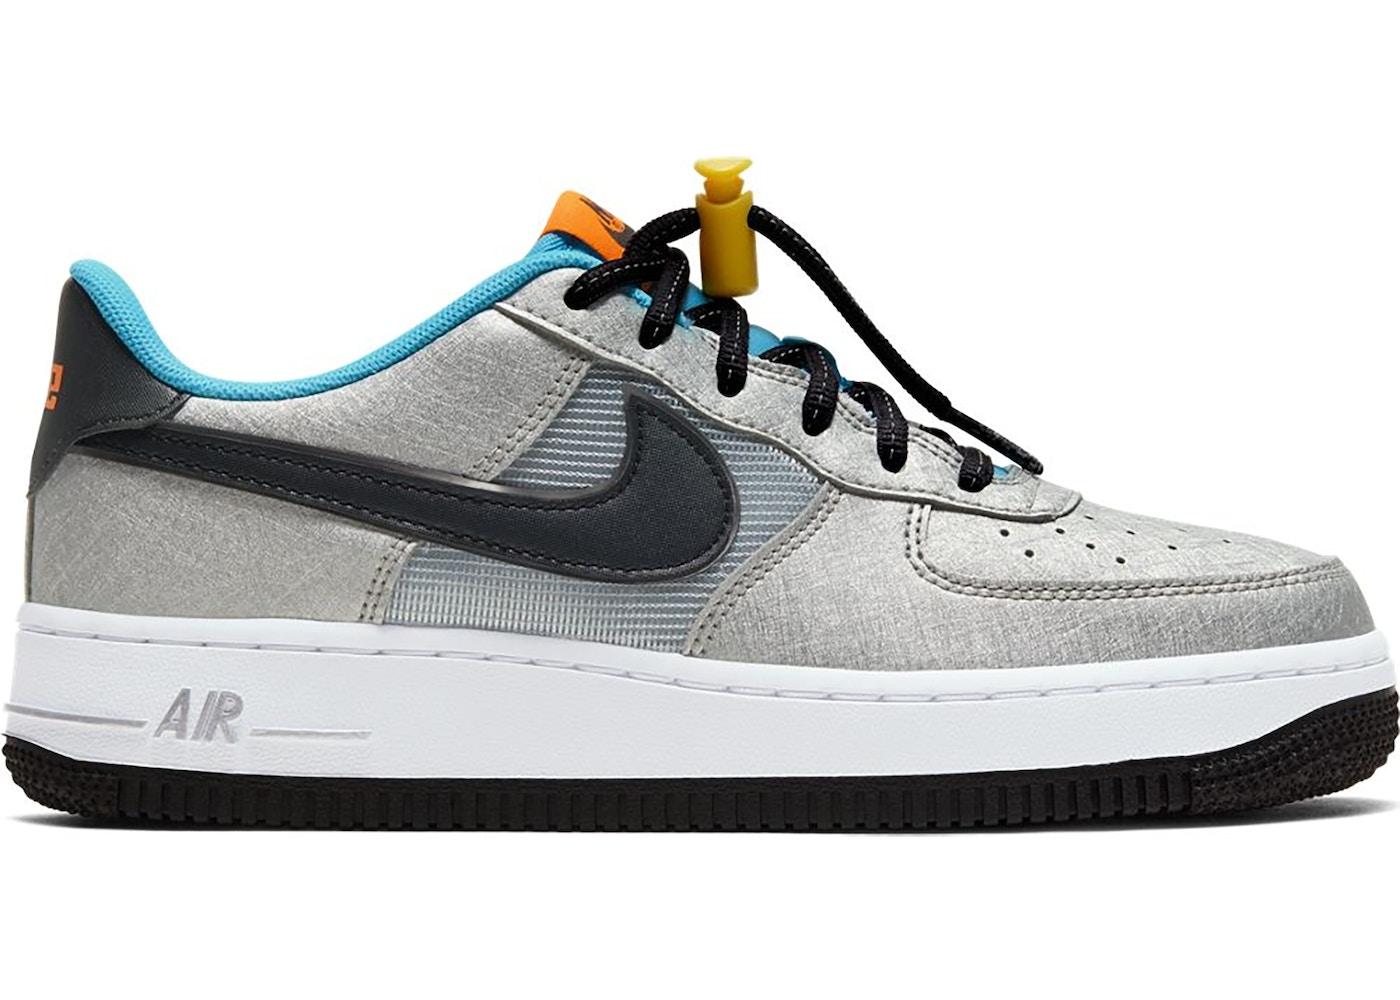 Nike Air Force 1 Low Sky Nike Pack (GS) - CW6011-001